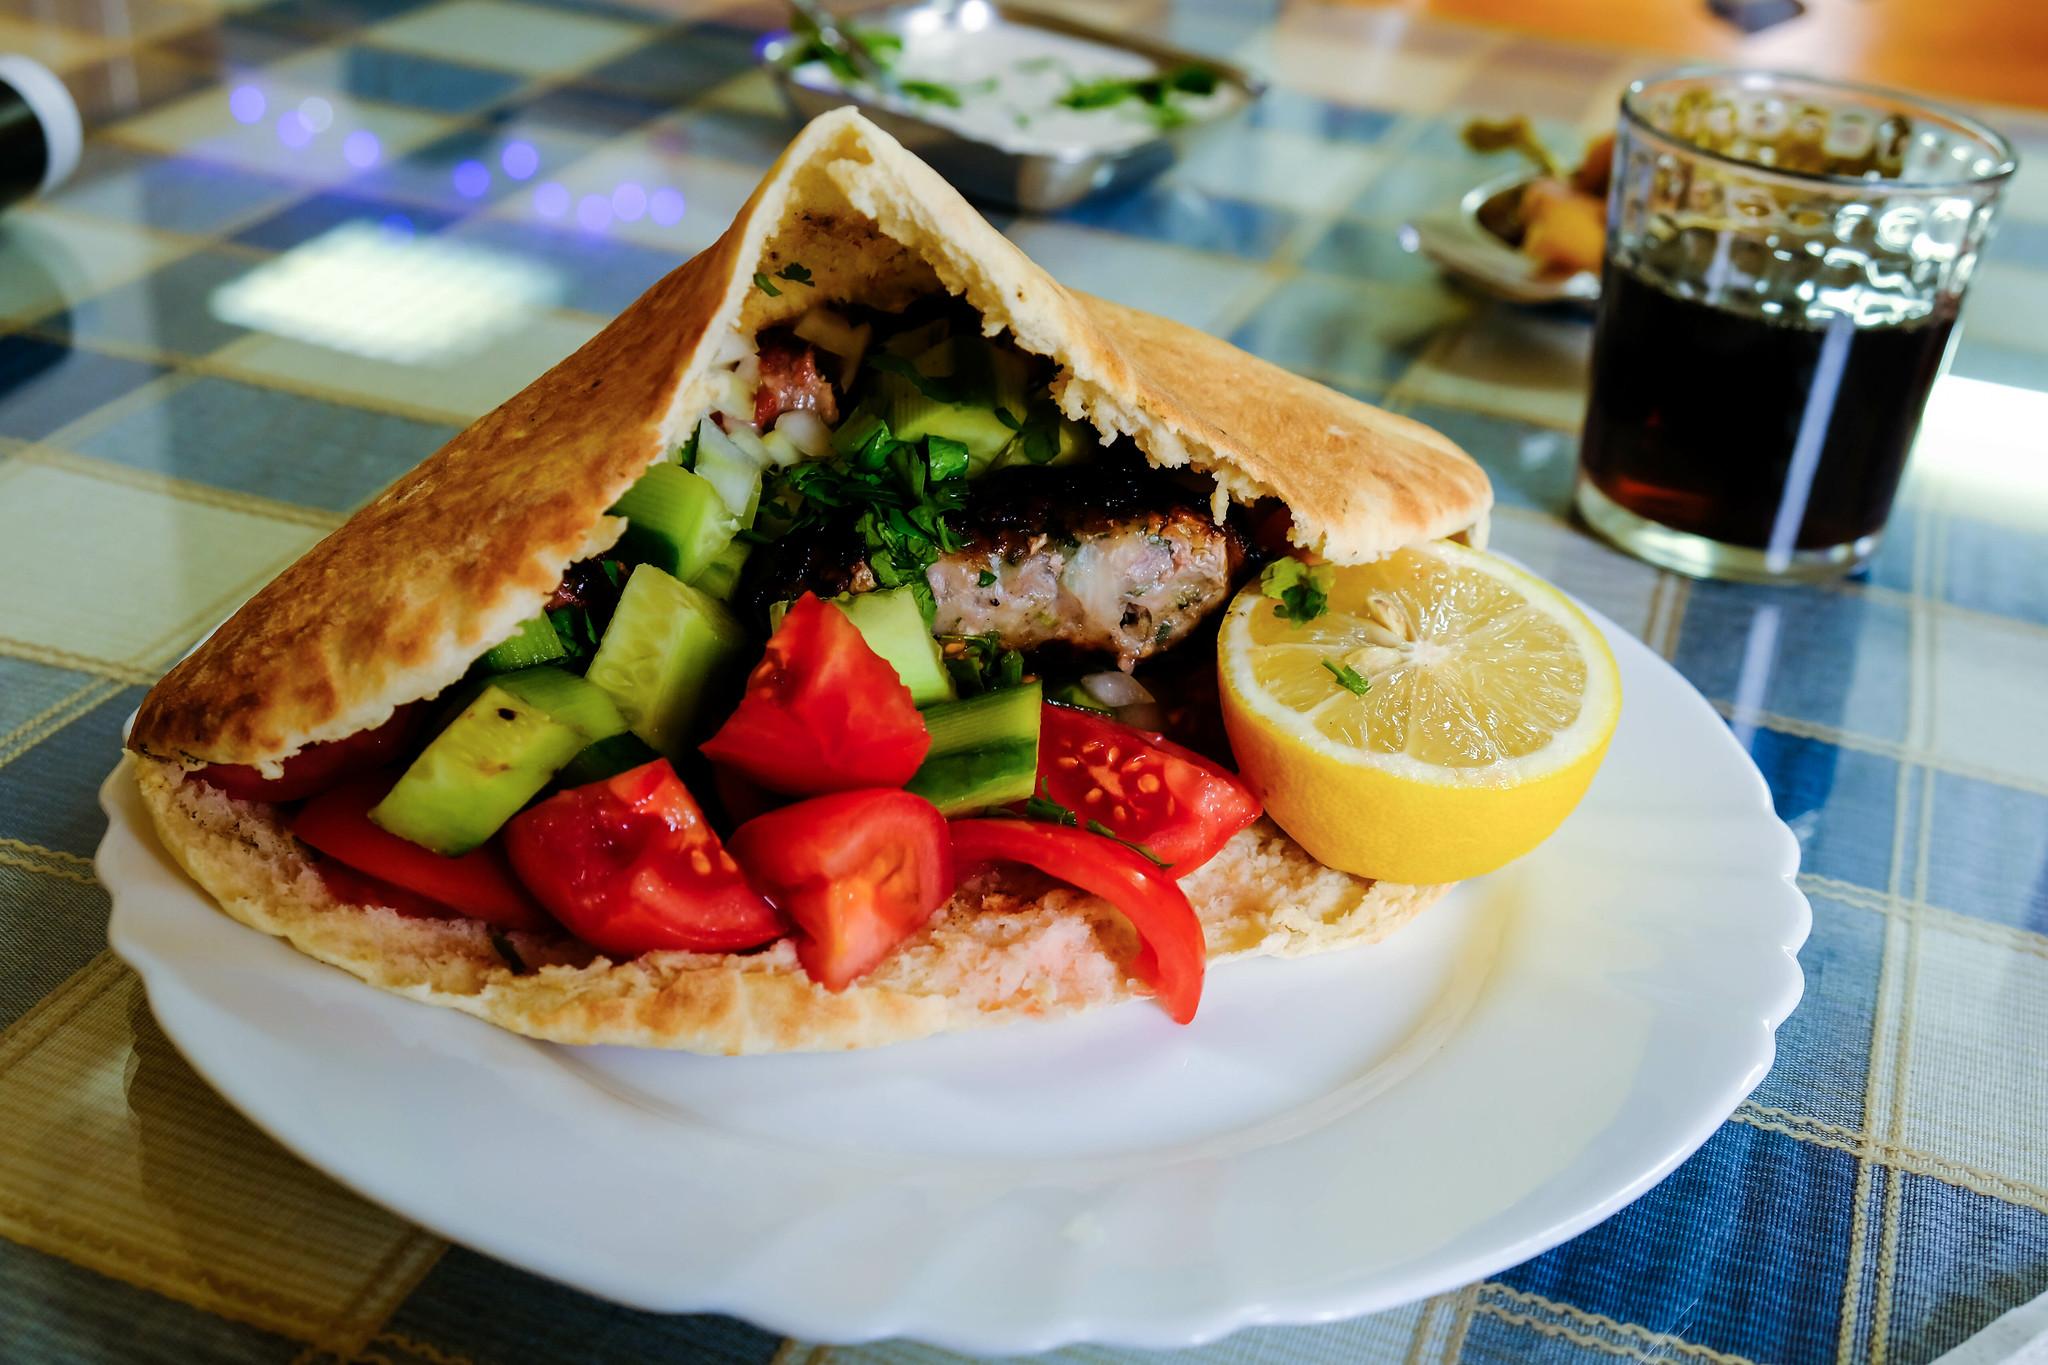 food in Albania, Albanian food, Albanian dishes, Albanian Cuisine, traditional food in Albania